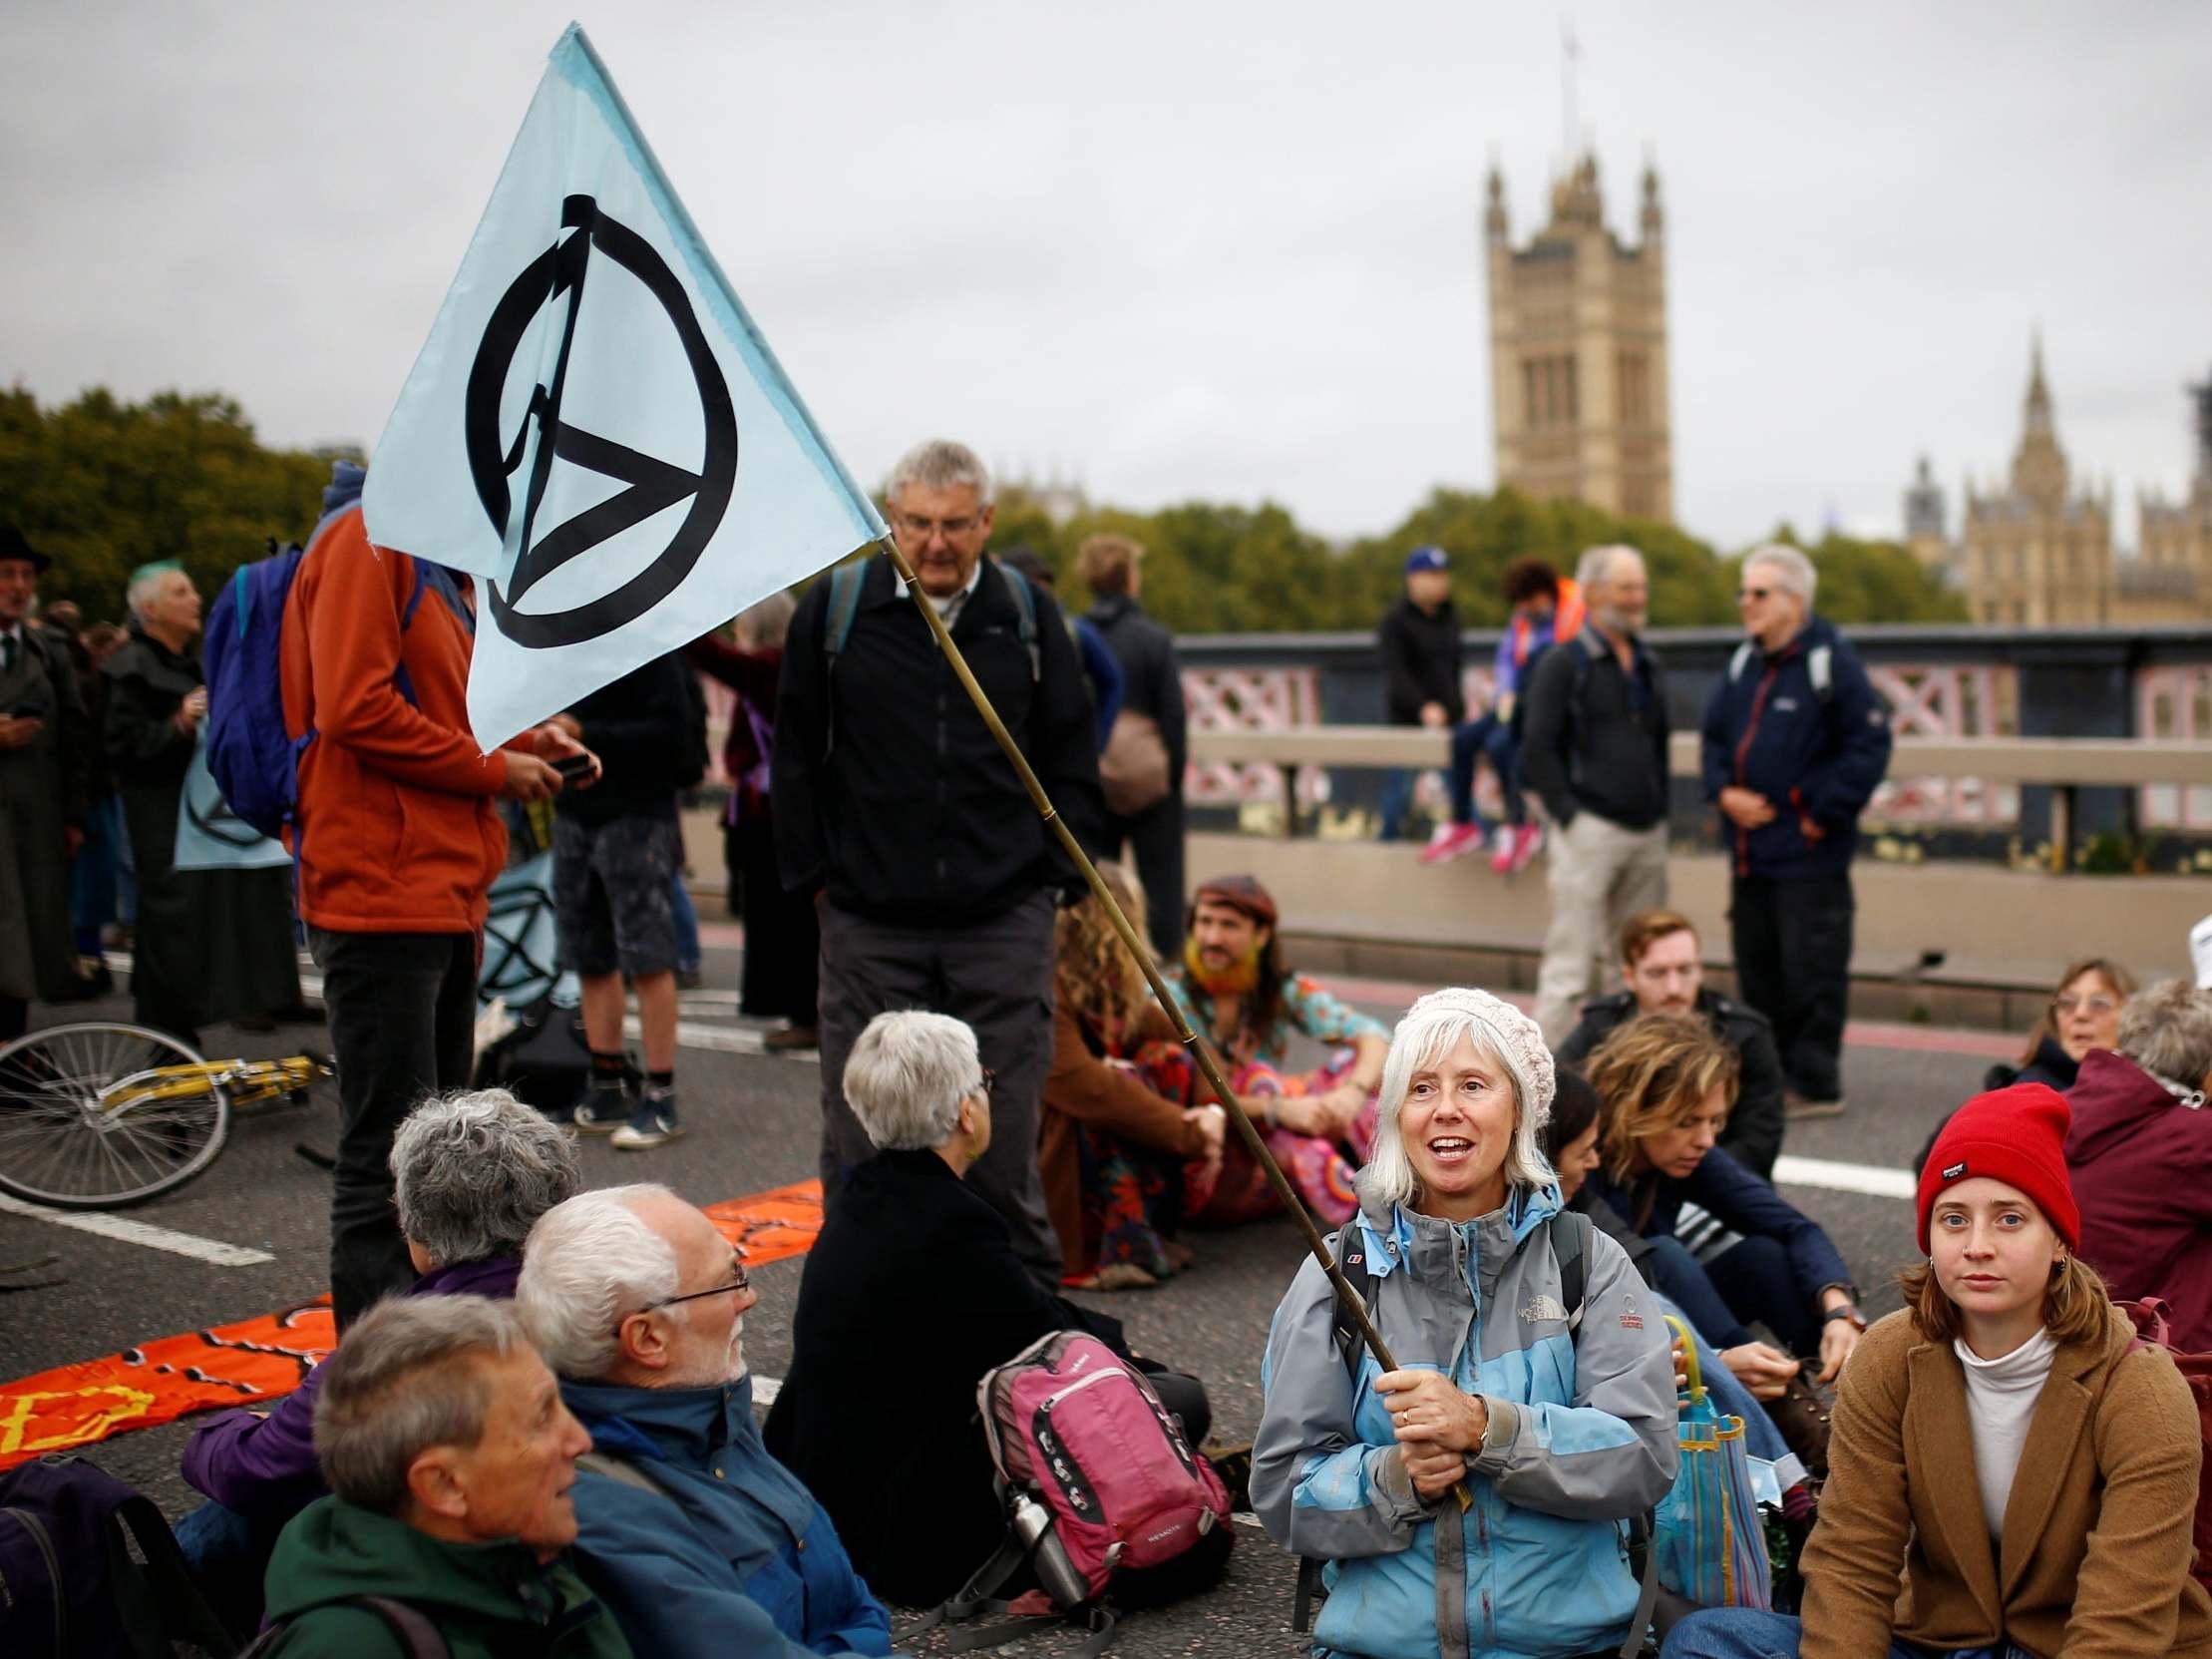 Extinction Rebellion protests - live: Climate activists shut down parts of central London as police arrest more than 200 demonstrators